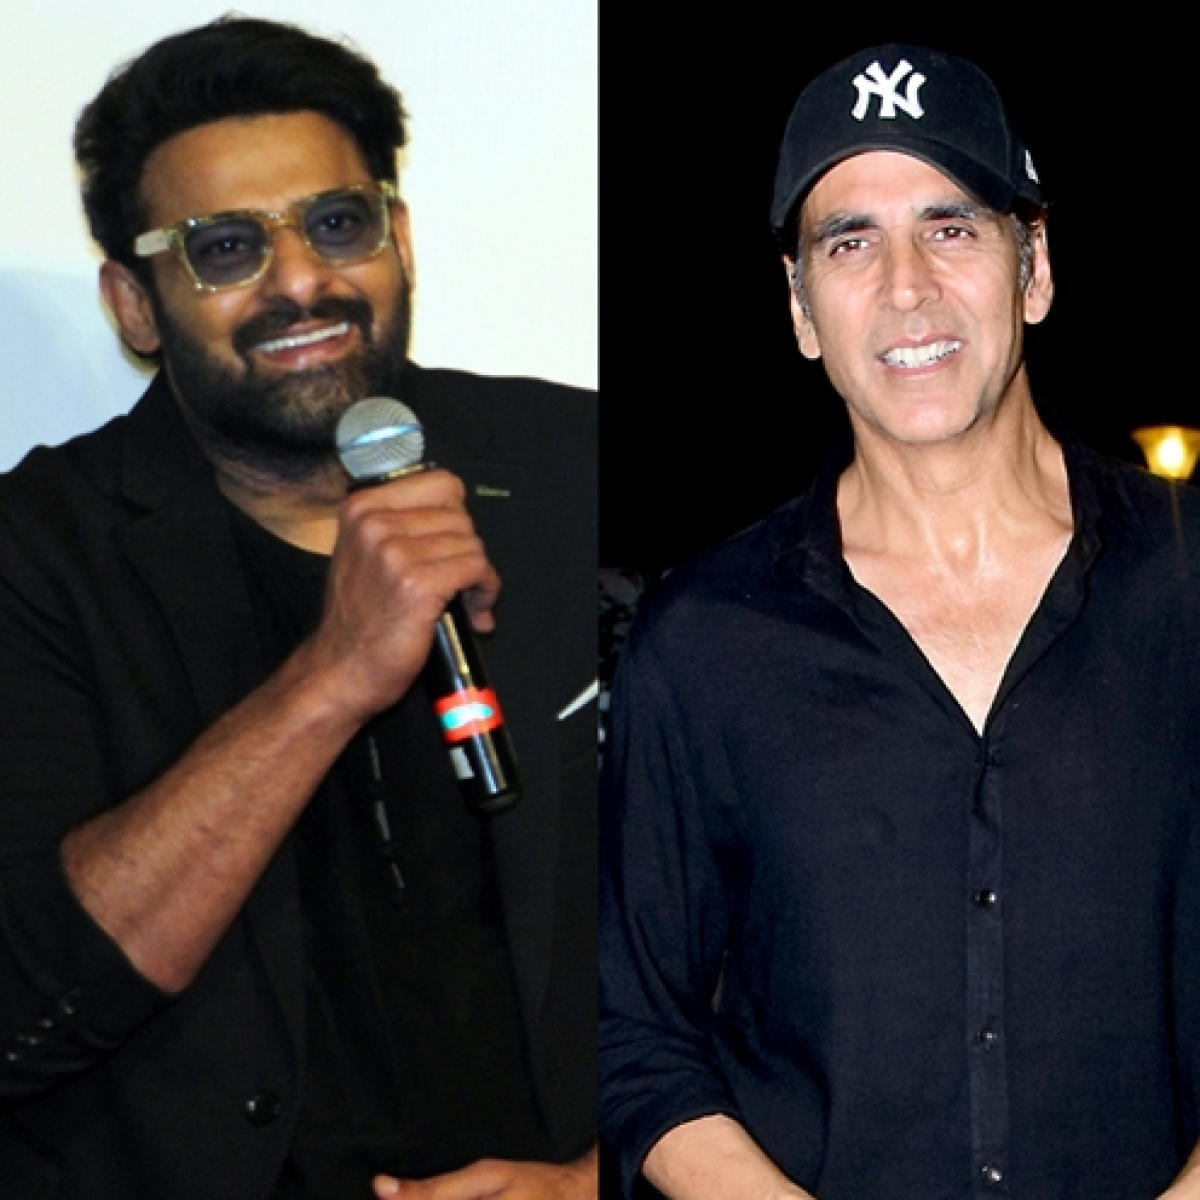 Not just Akshay Kumar's Rs 25 crore, here's how much celebrities have donated to fight coronavirus